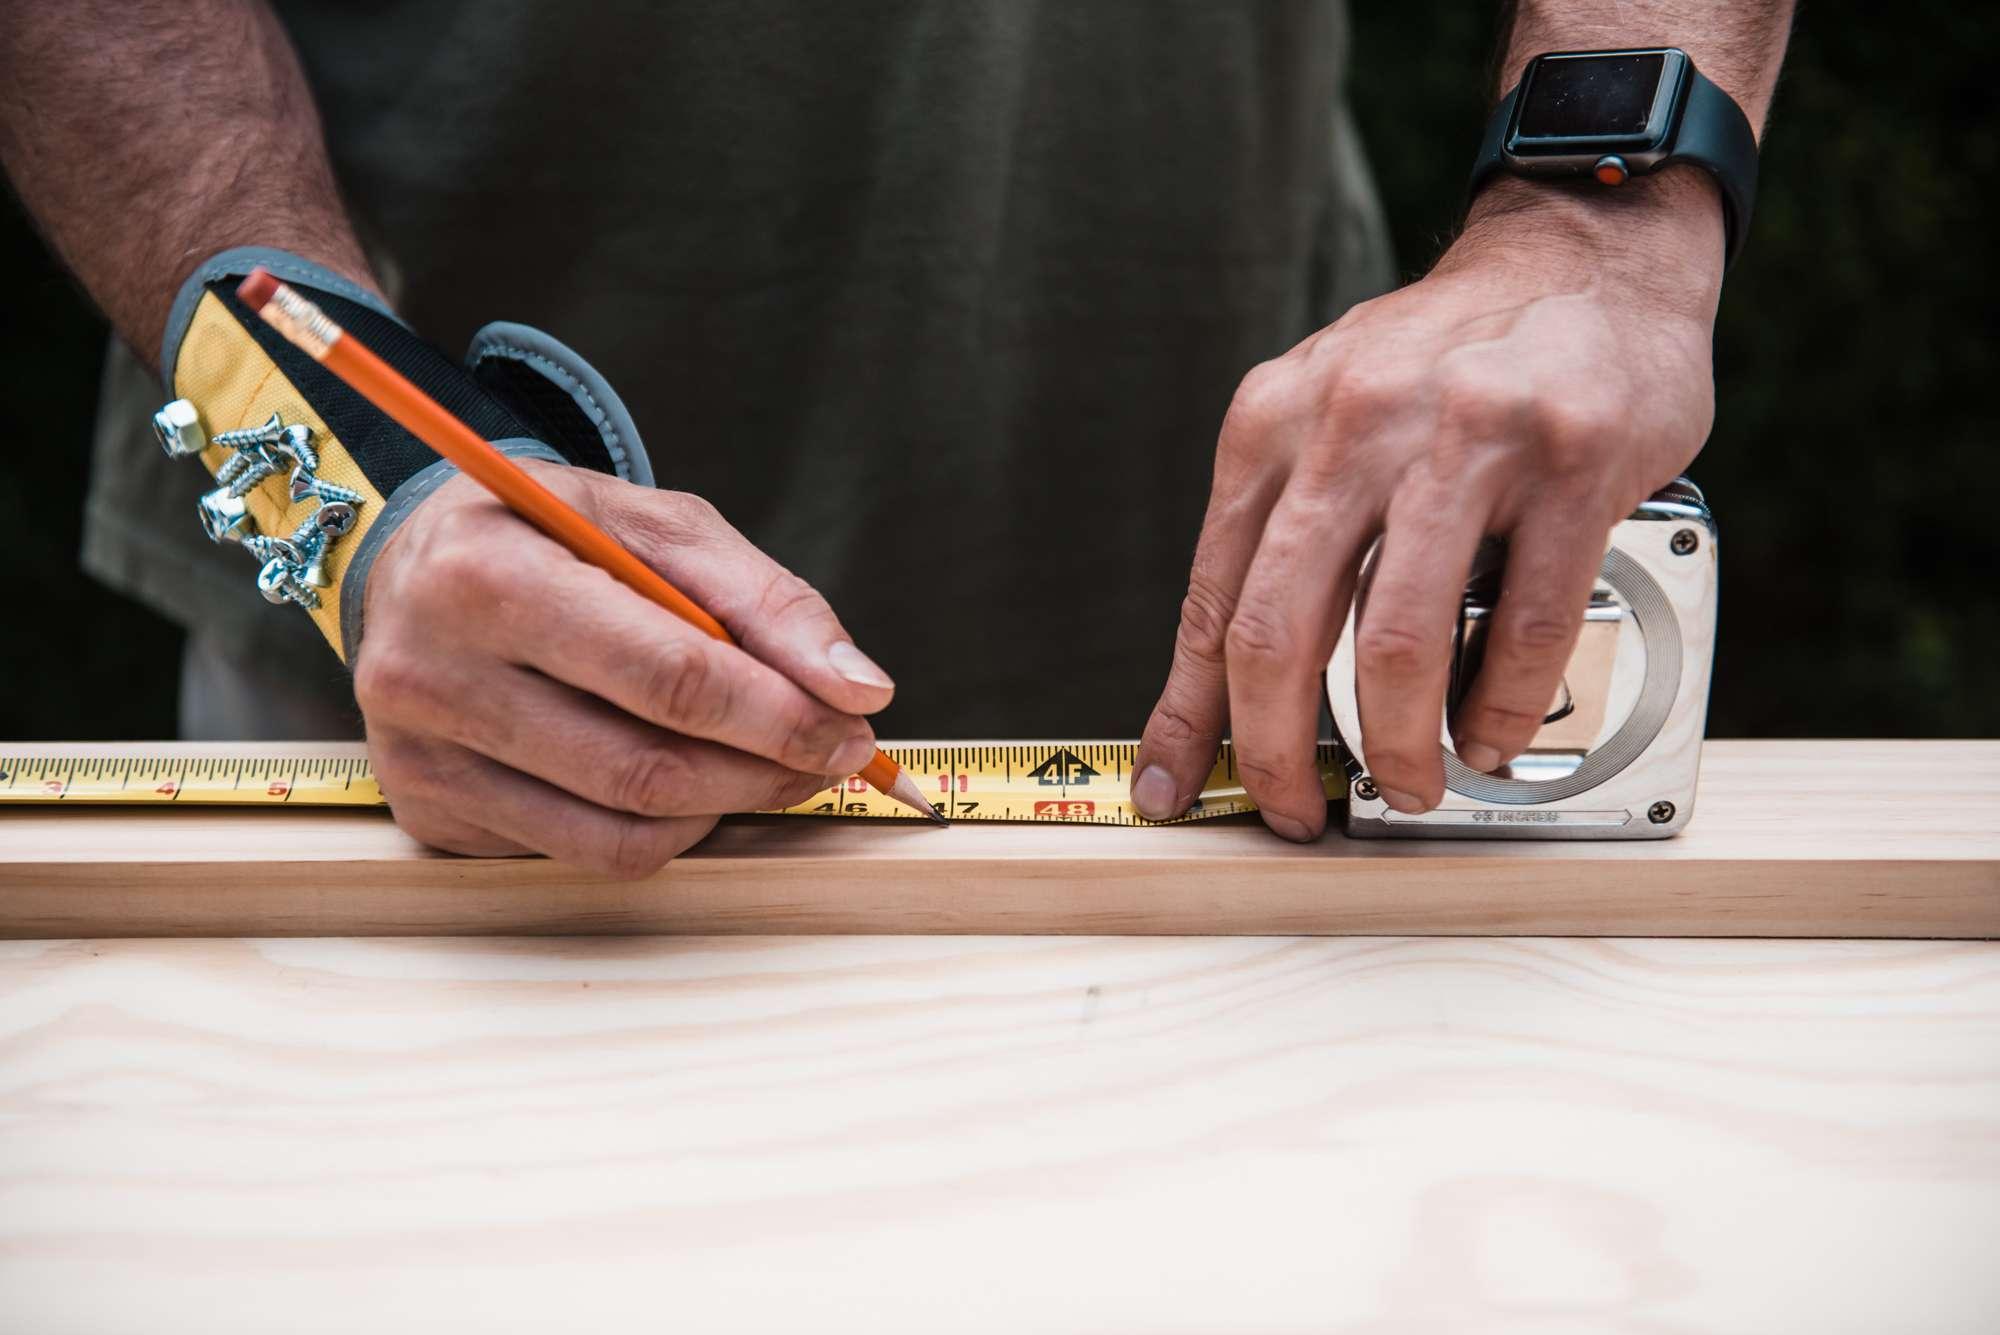 marking plywood